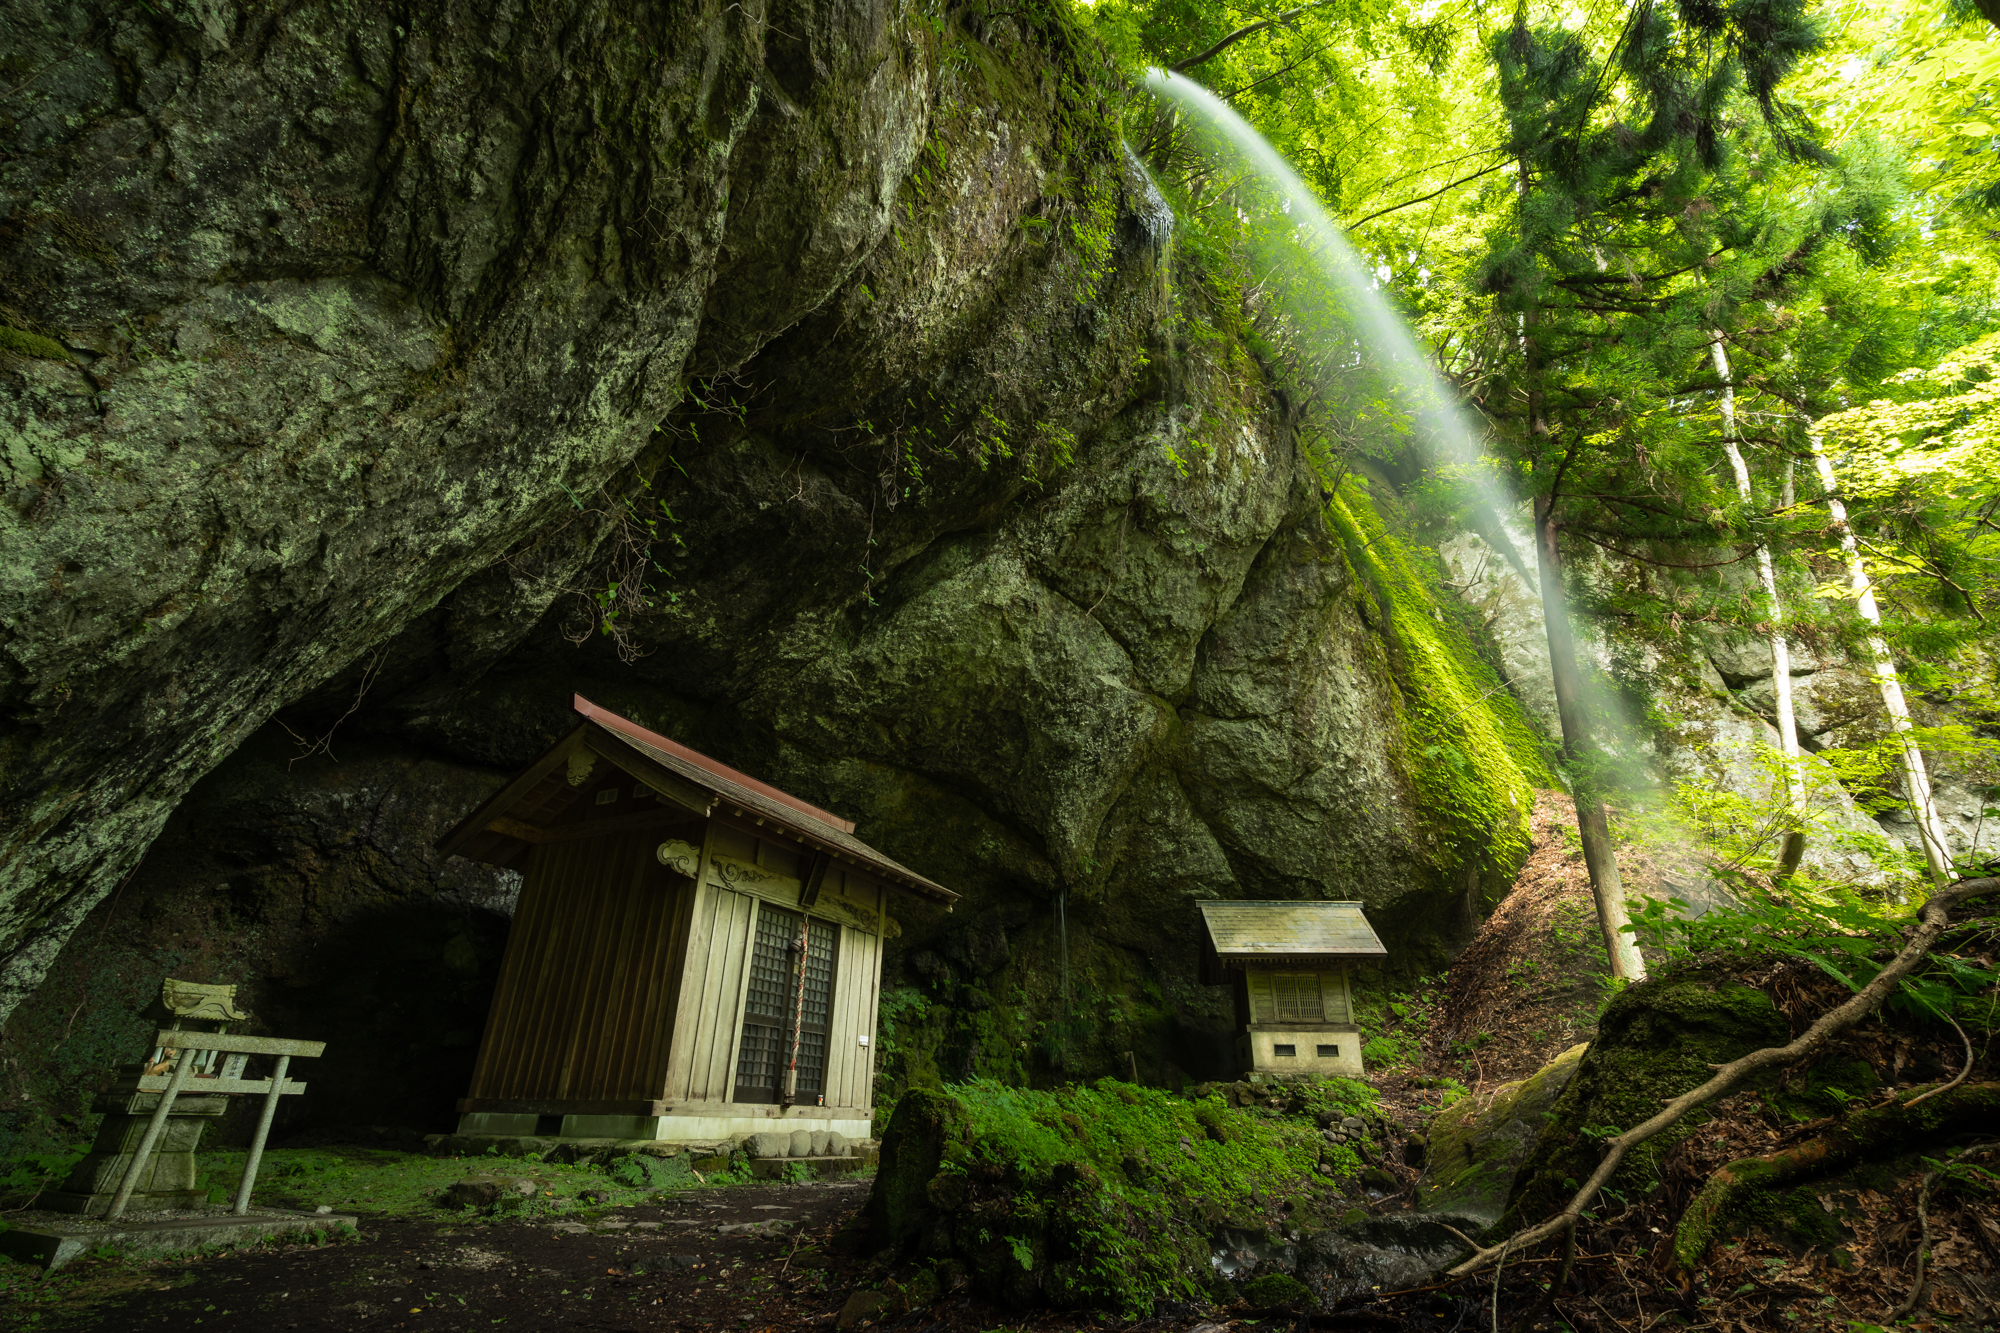 DSC01044 兵庫県 吉滝(滝と神社の幻想的な景色!  関西・近畿・兵庫県の滝スポット!撮影した写真の紹介、 アクセス情報や撮影ポイントなど!)